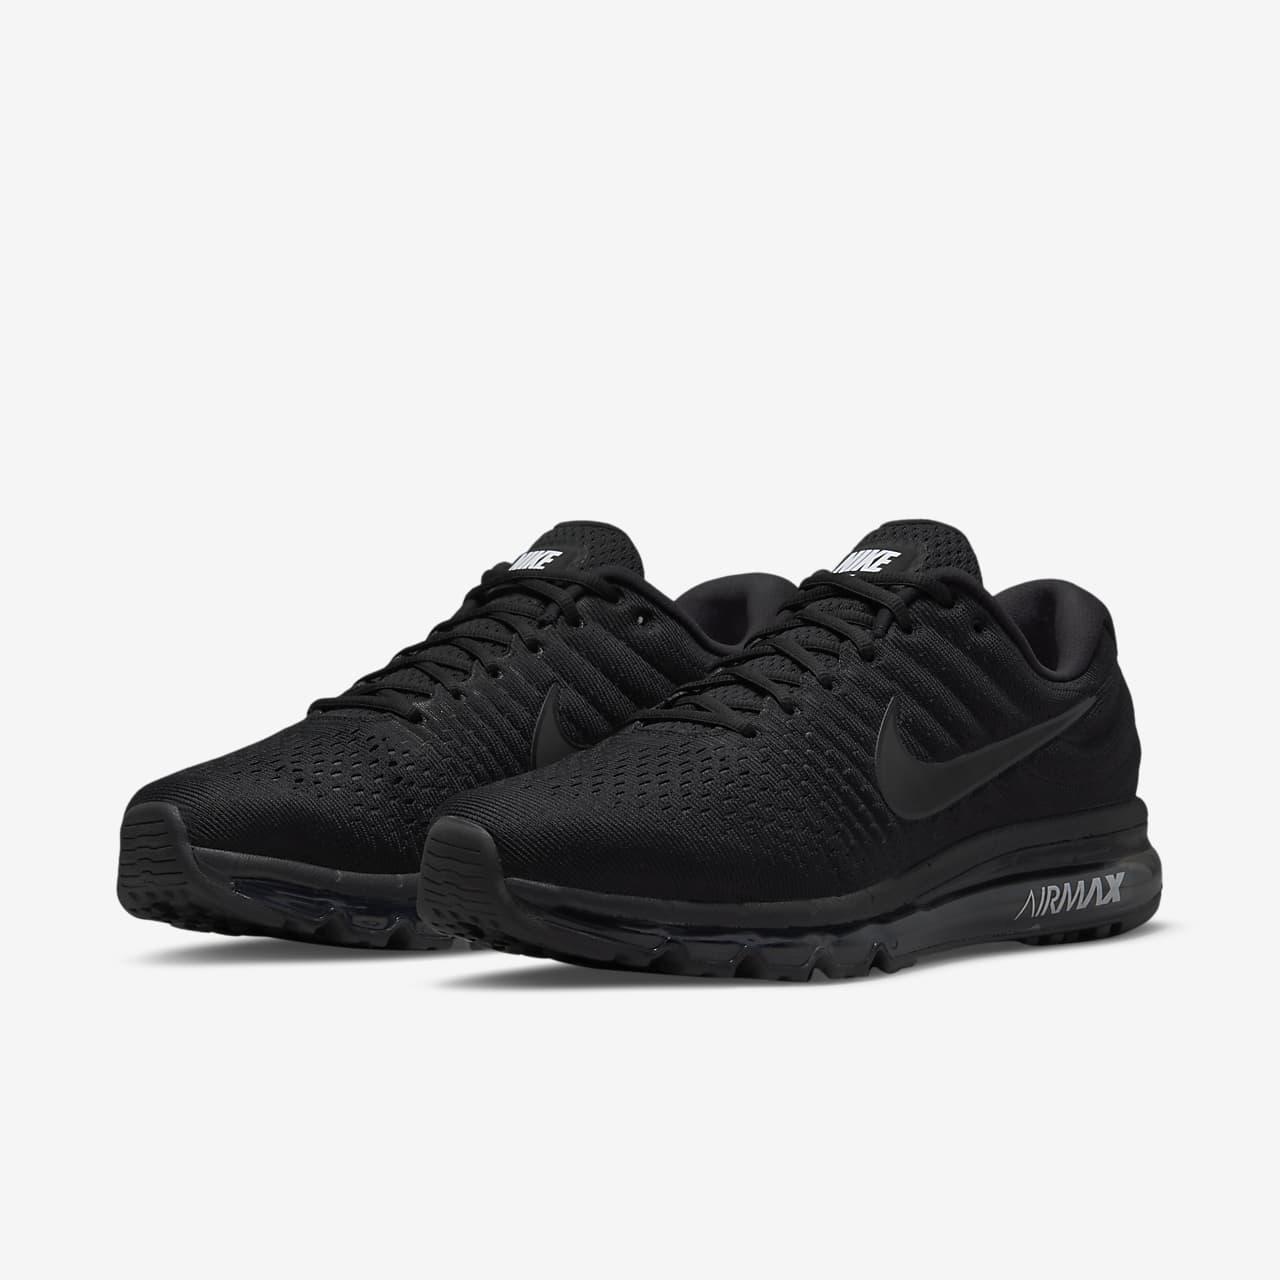 brand new 047c4 ccb46 ... Nike Air Max 2017 Men s Shoe